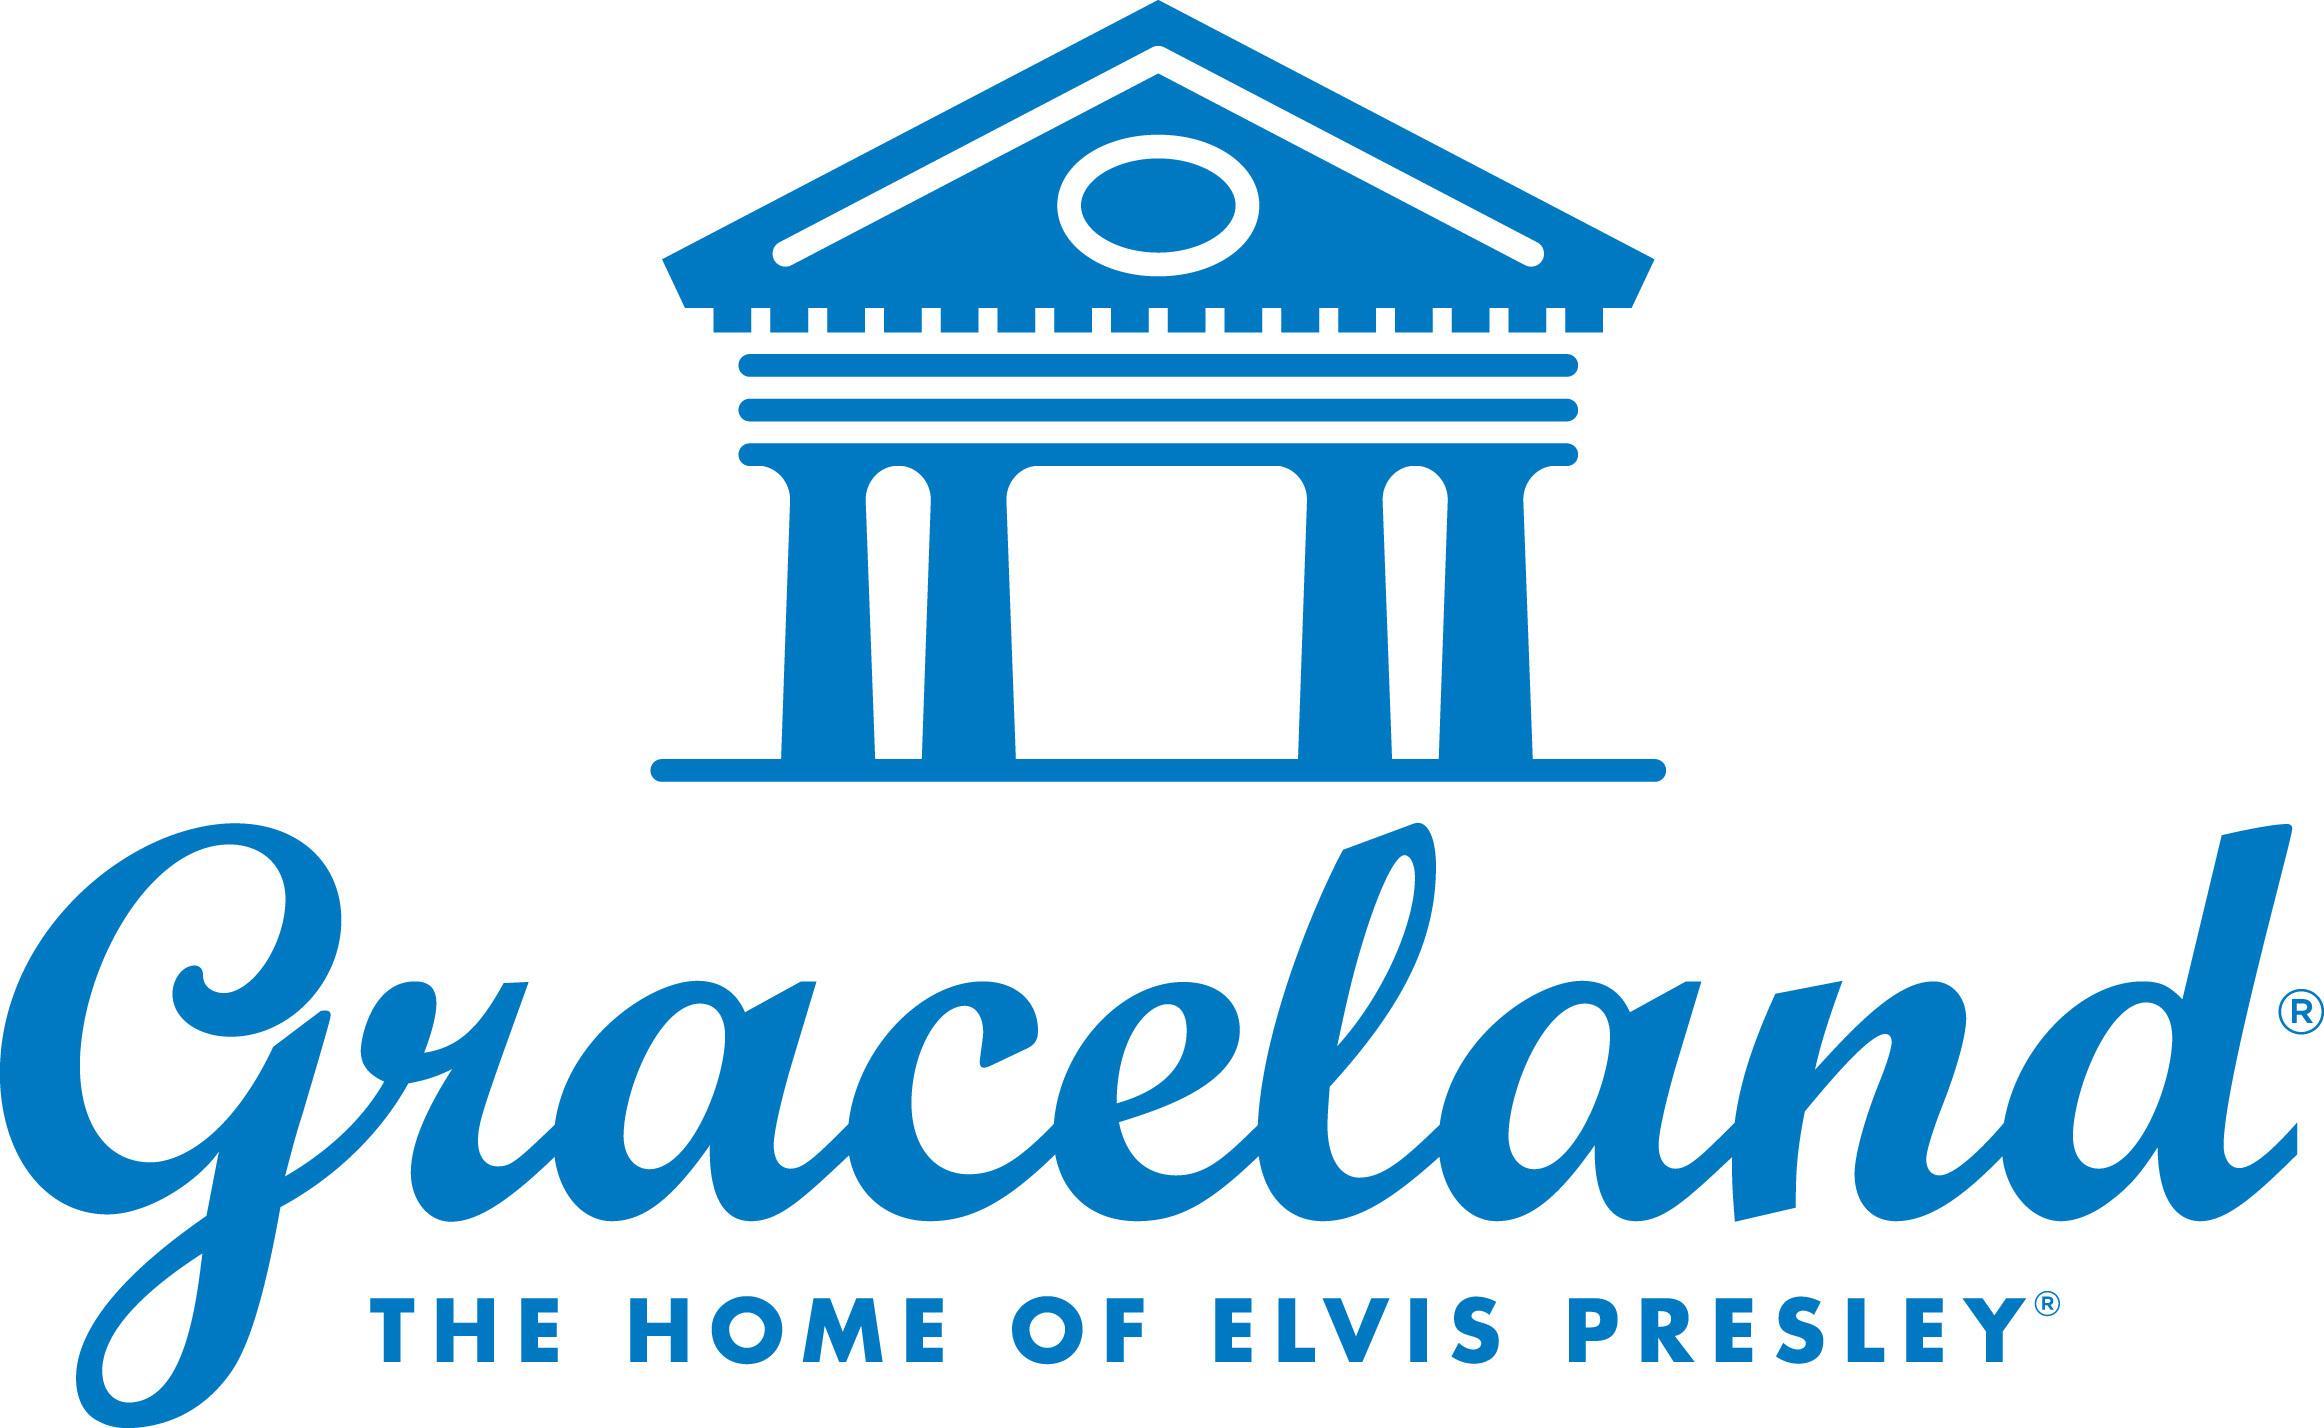 Largest Elvis Week Ever Expected at Elvis Presley's Graceland in